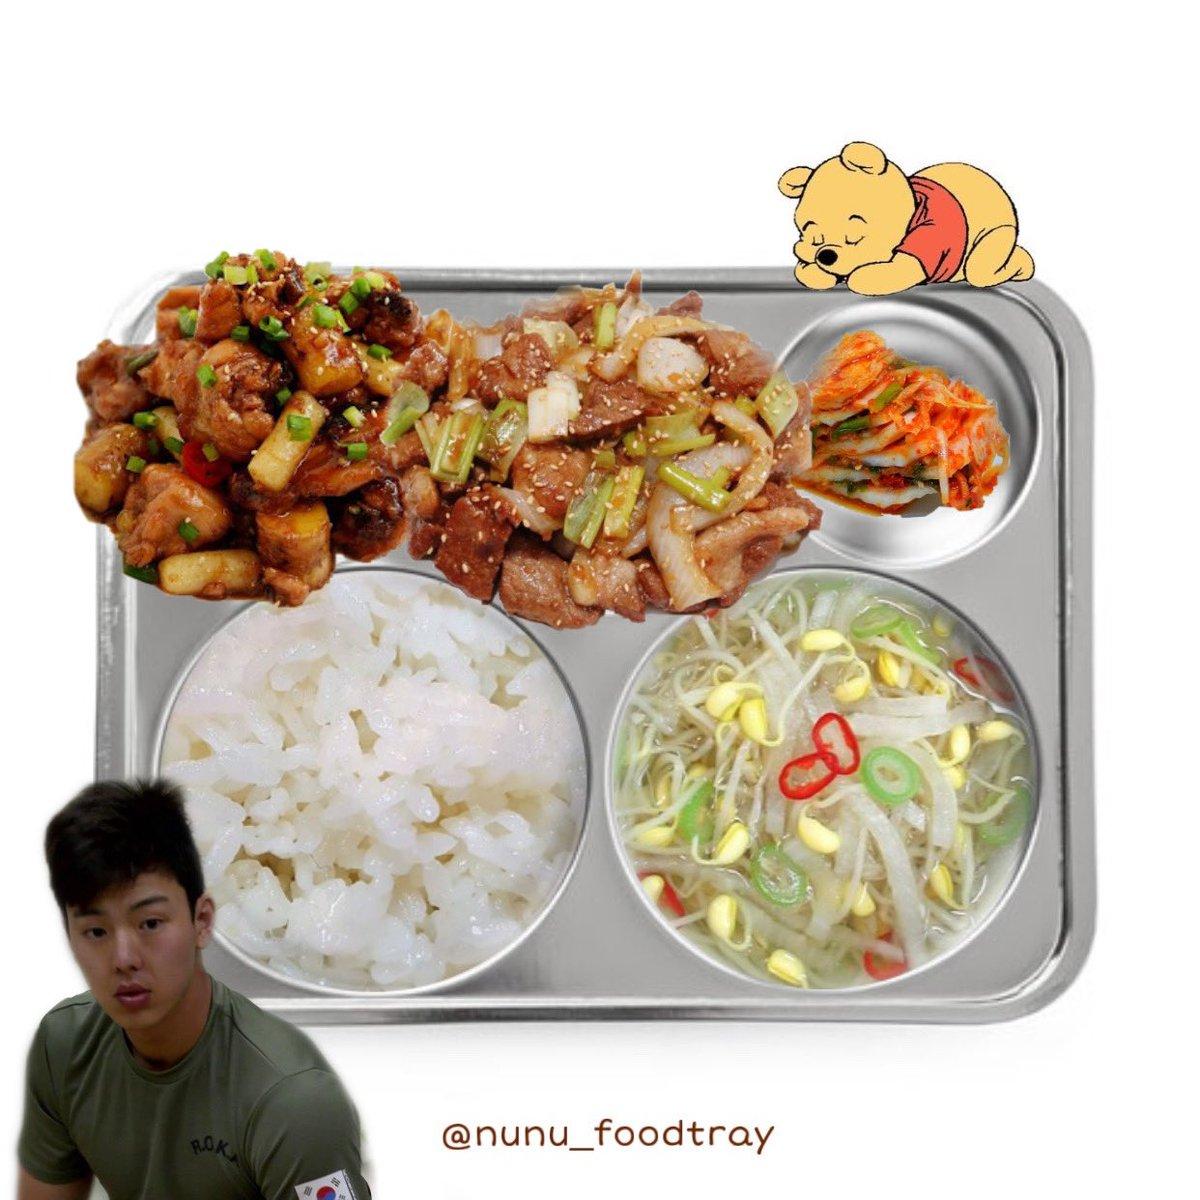 @nunu_foodtray's photo on shownu